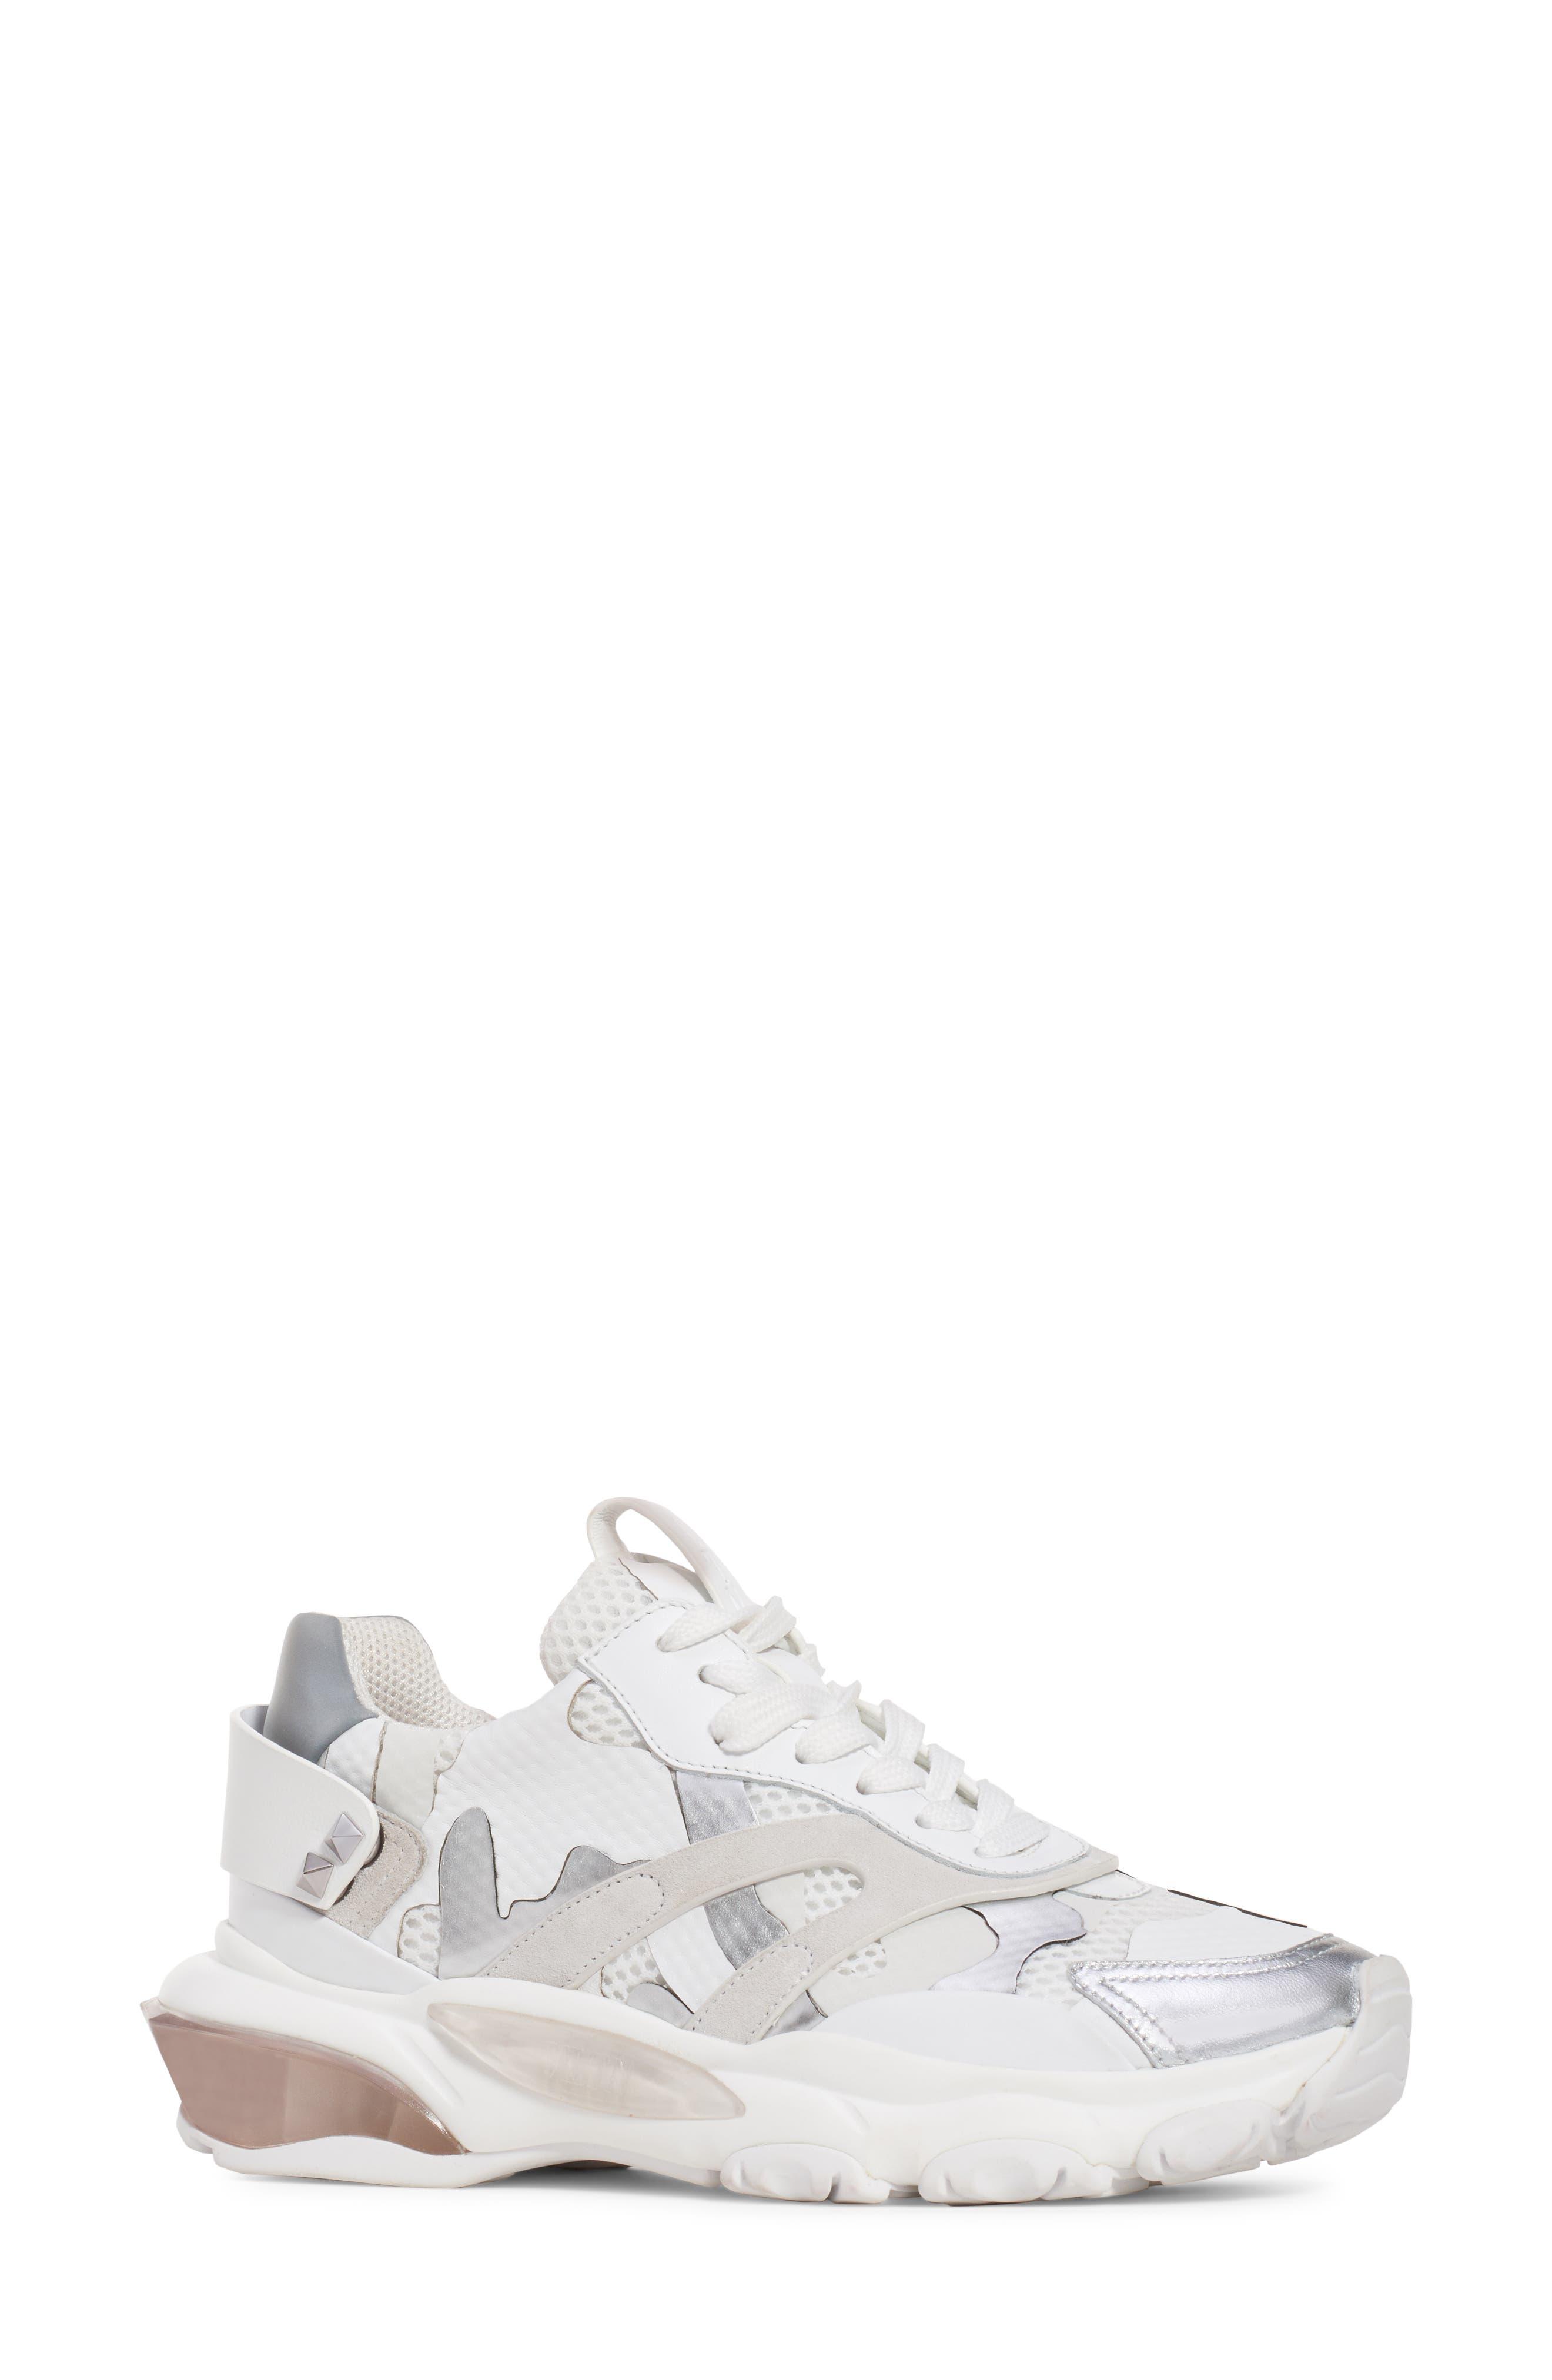 Camo Sneaker,                             Main thumbnail 1, color,                             WHITE